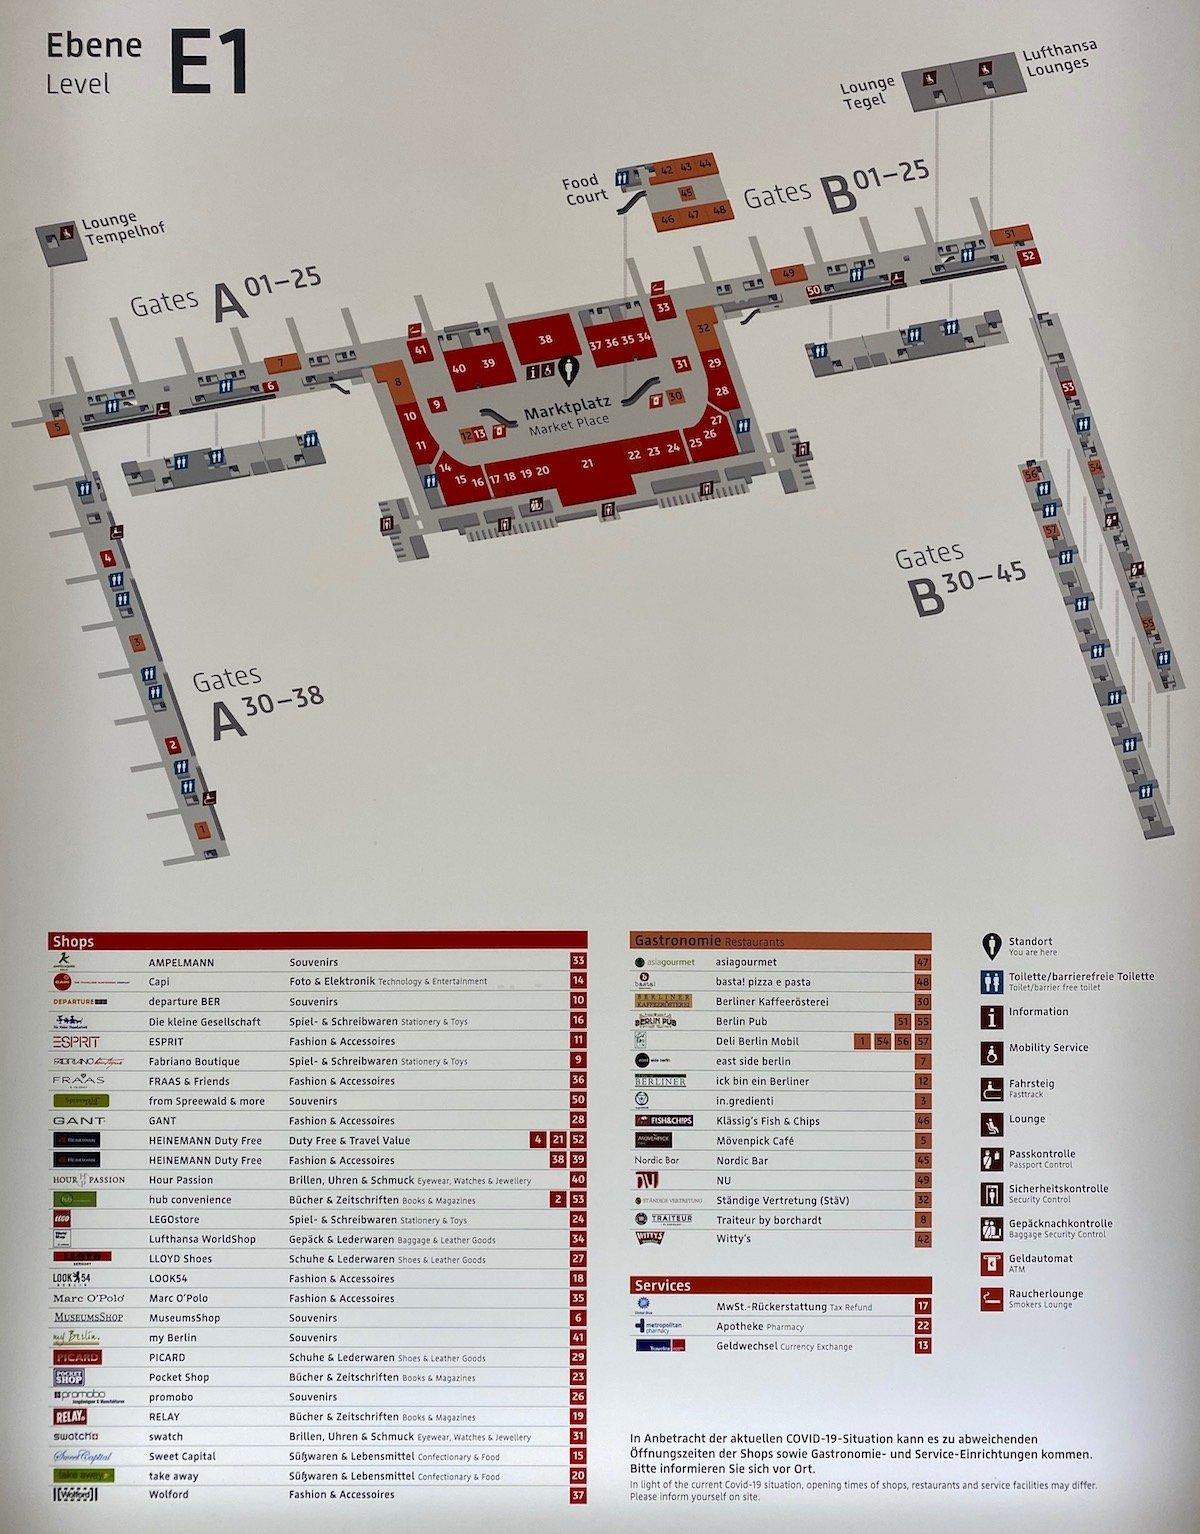 Review Lufthansa Lounge Berlin Brandenburg Airport   One Mile at ...